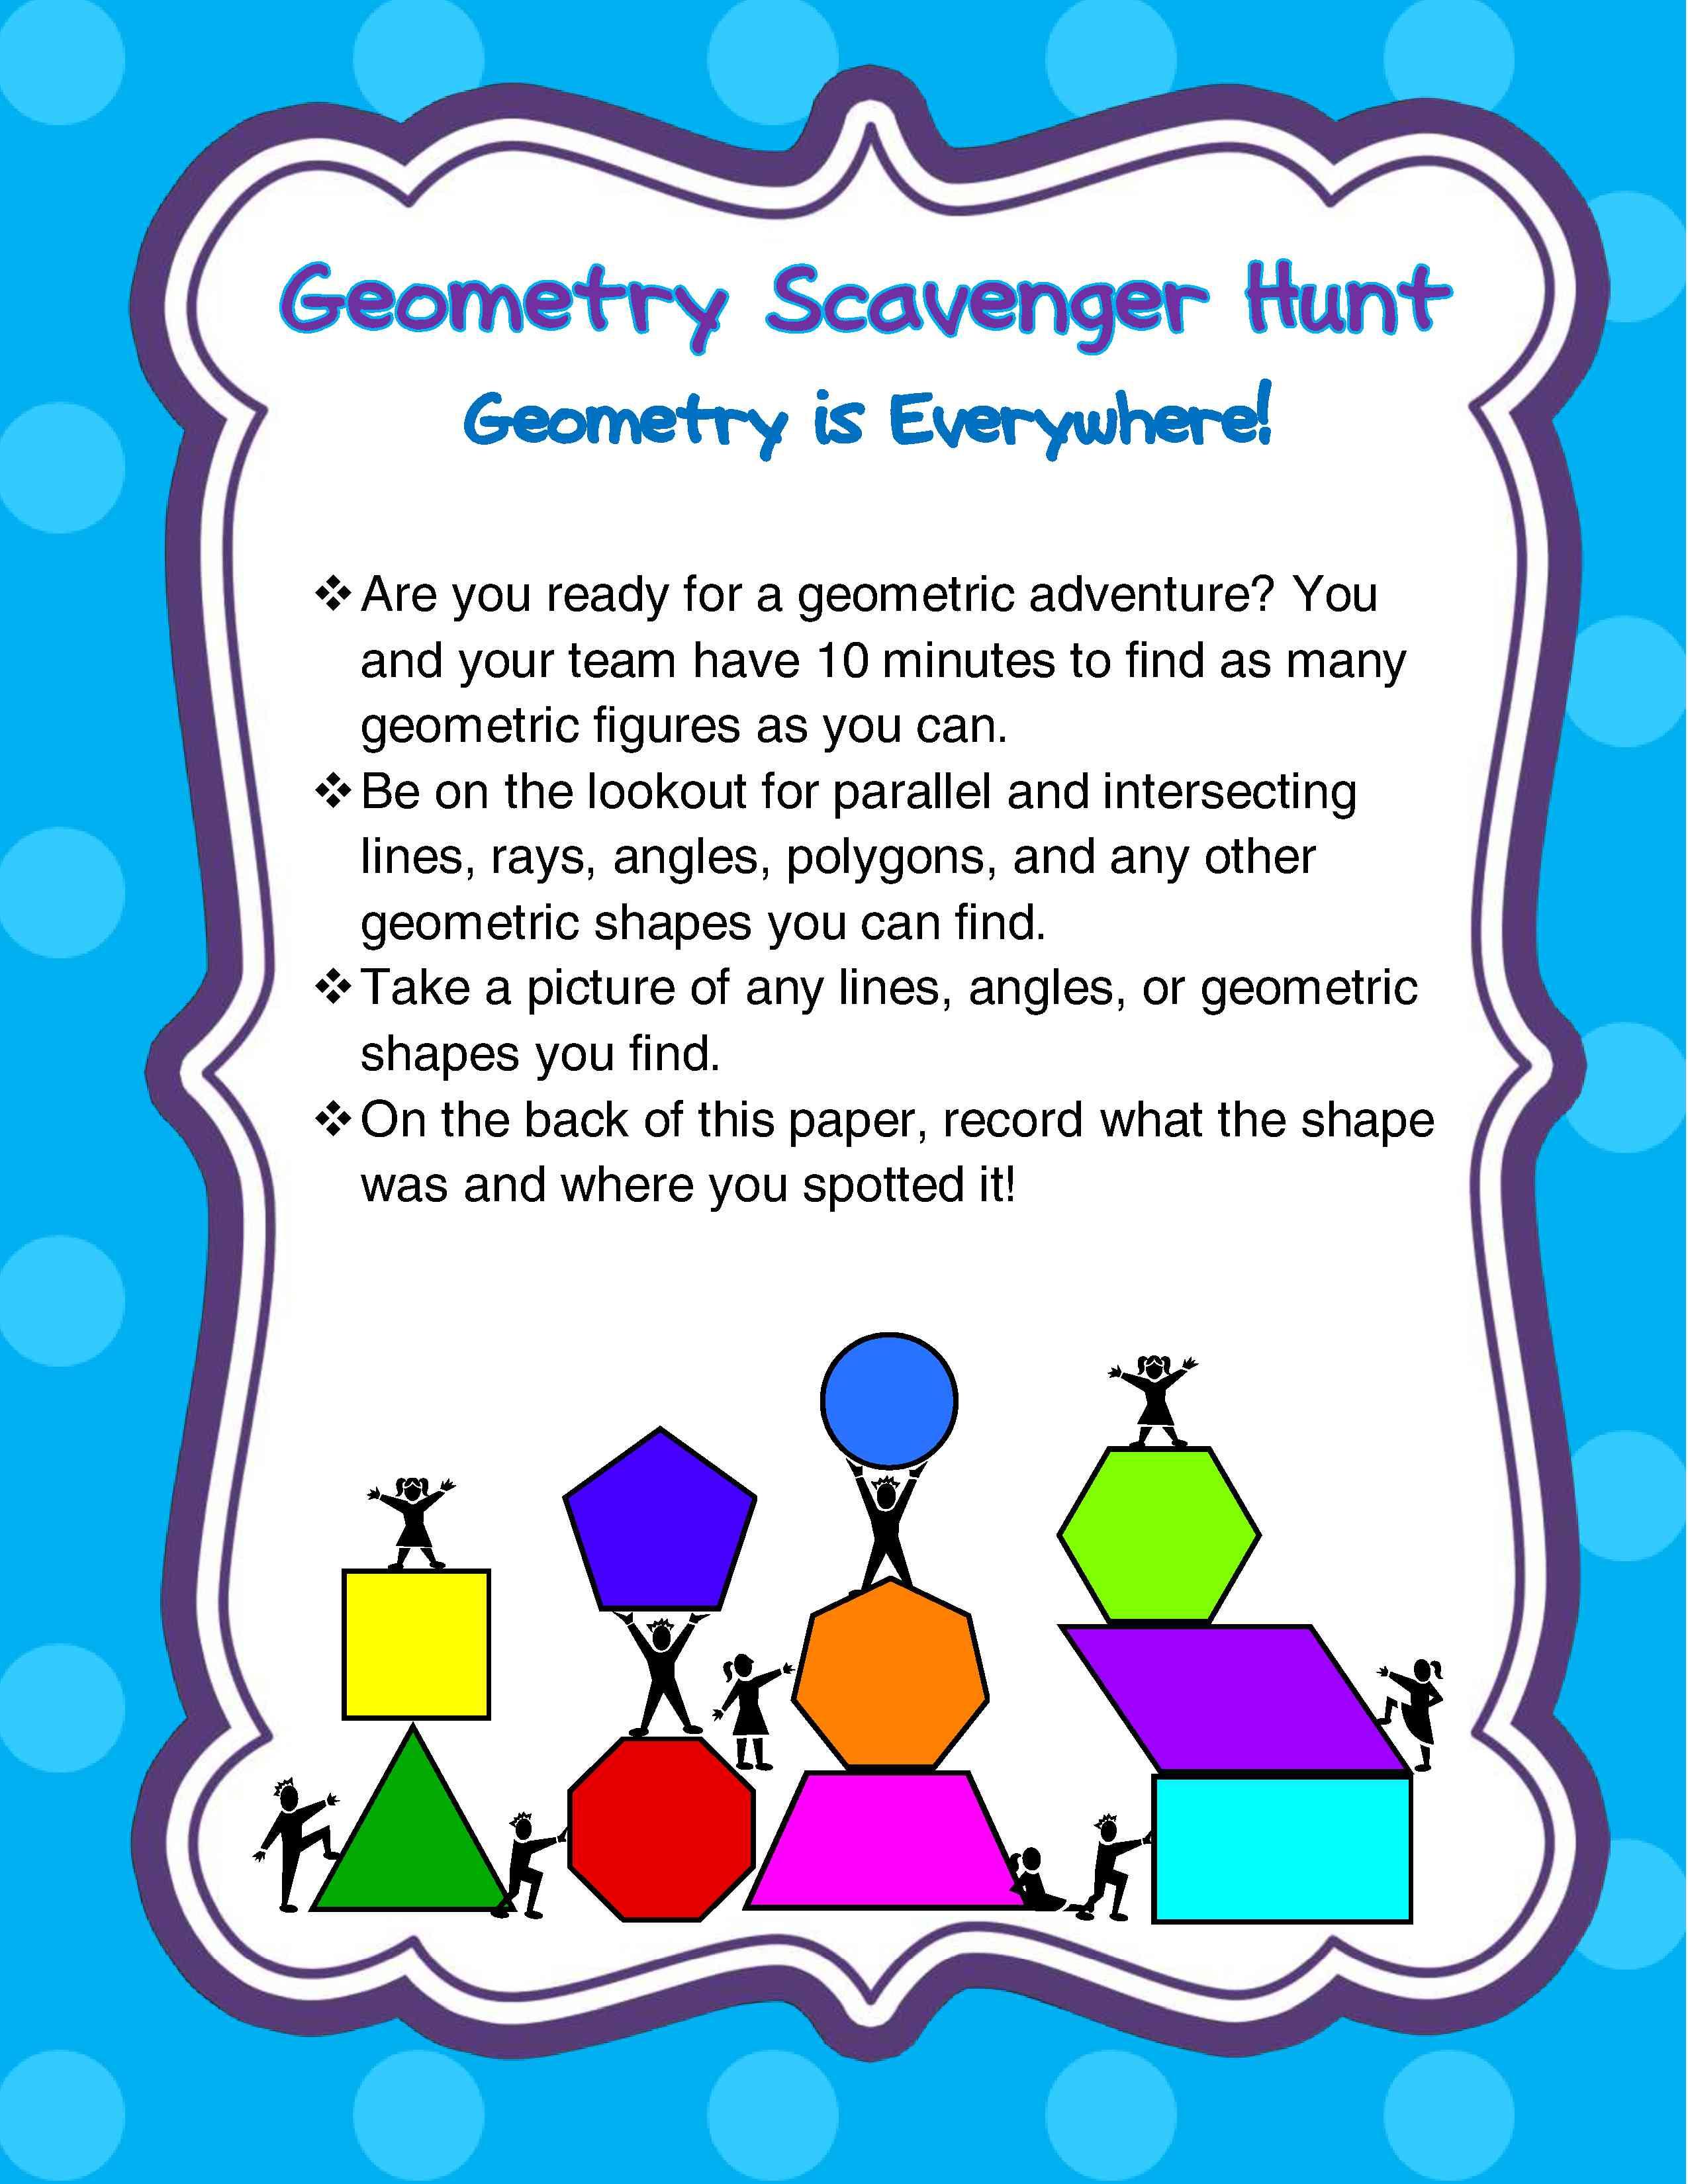 Five Ways To Make Geometry Memorable